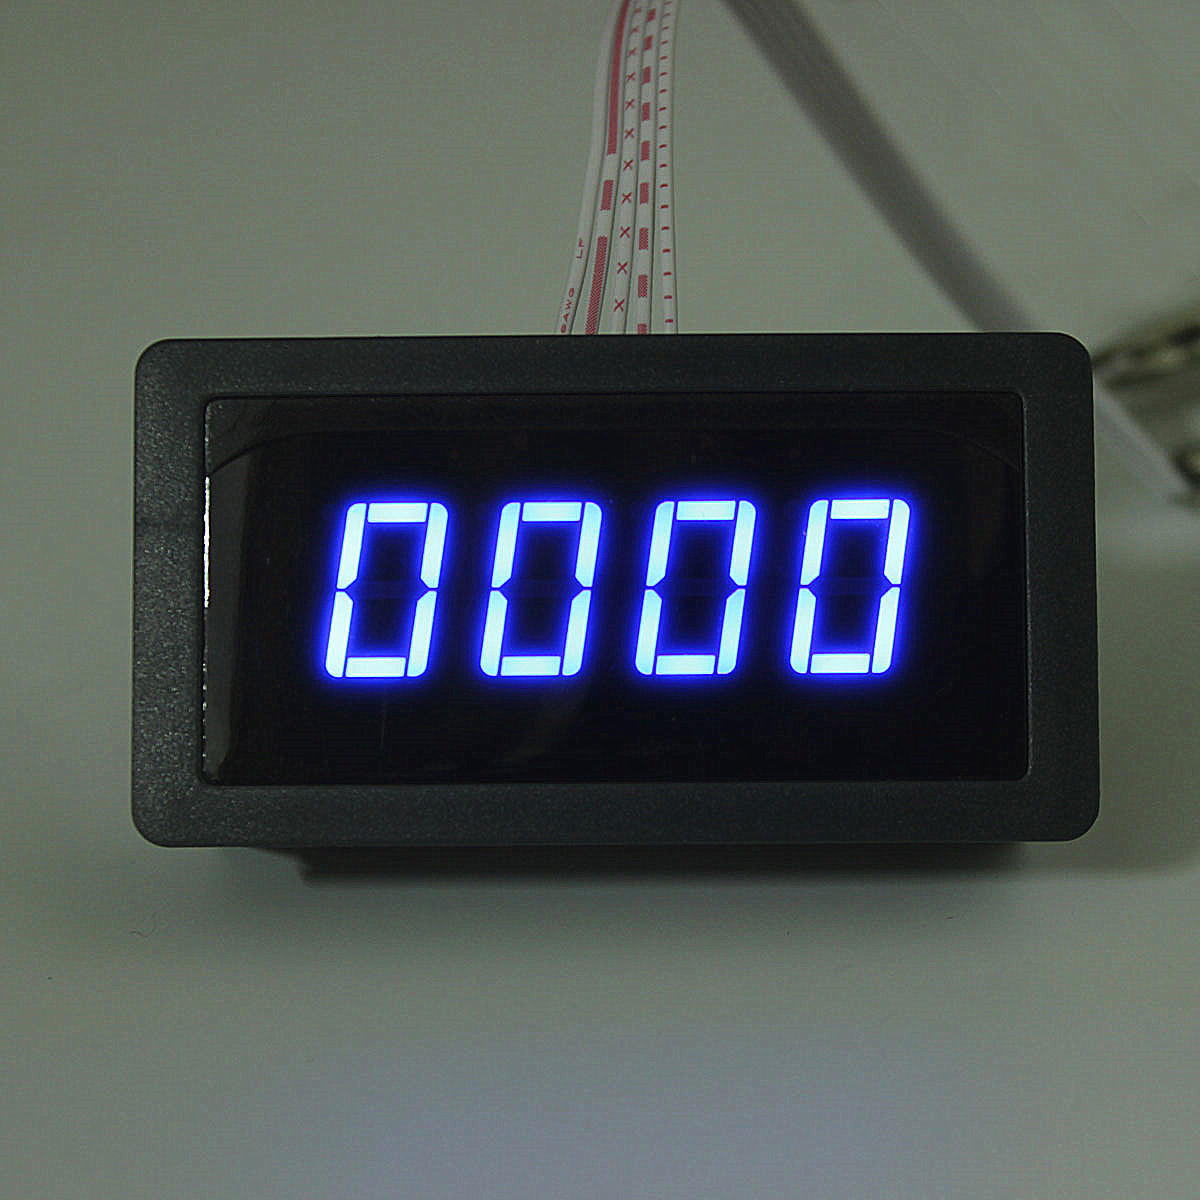 4 Digital Led Tachometer Rpm Speed Meter Proximity Switch Sensor Circuit Diagram For Automobiles Npn